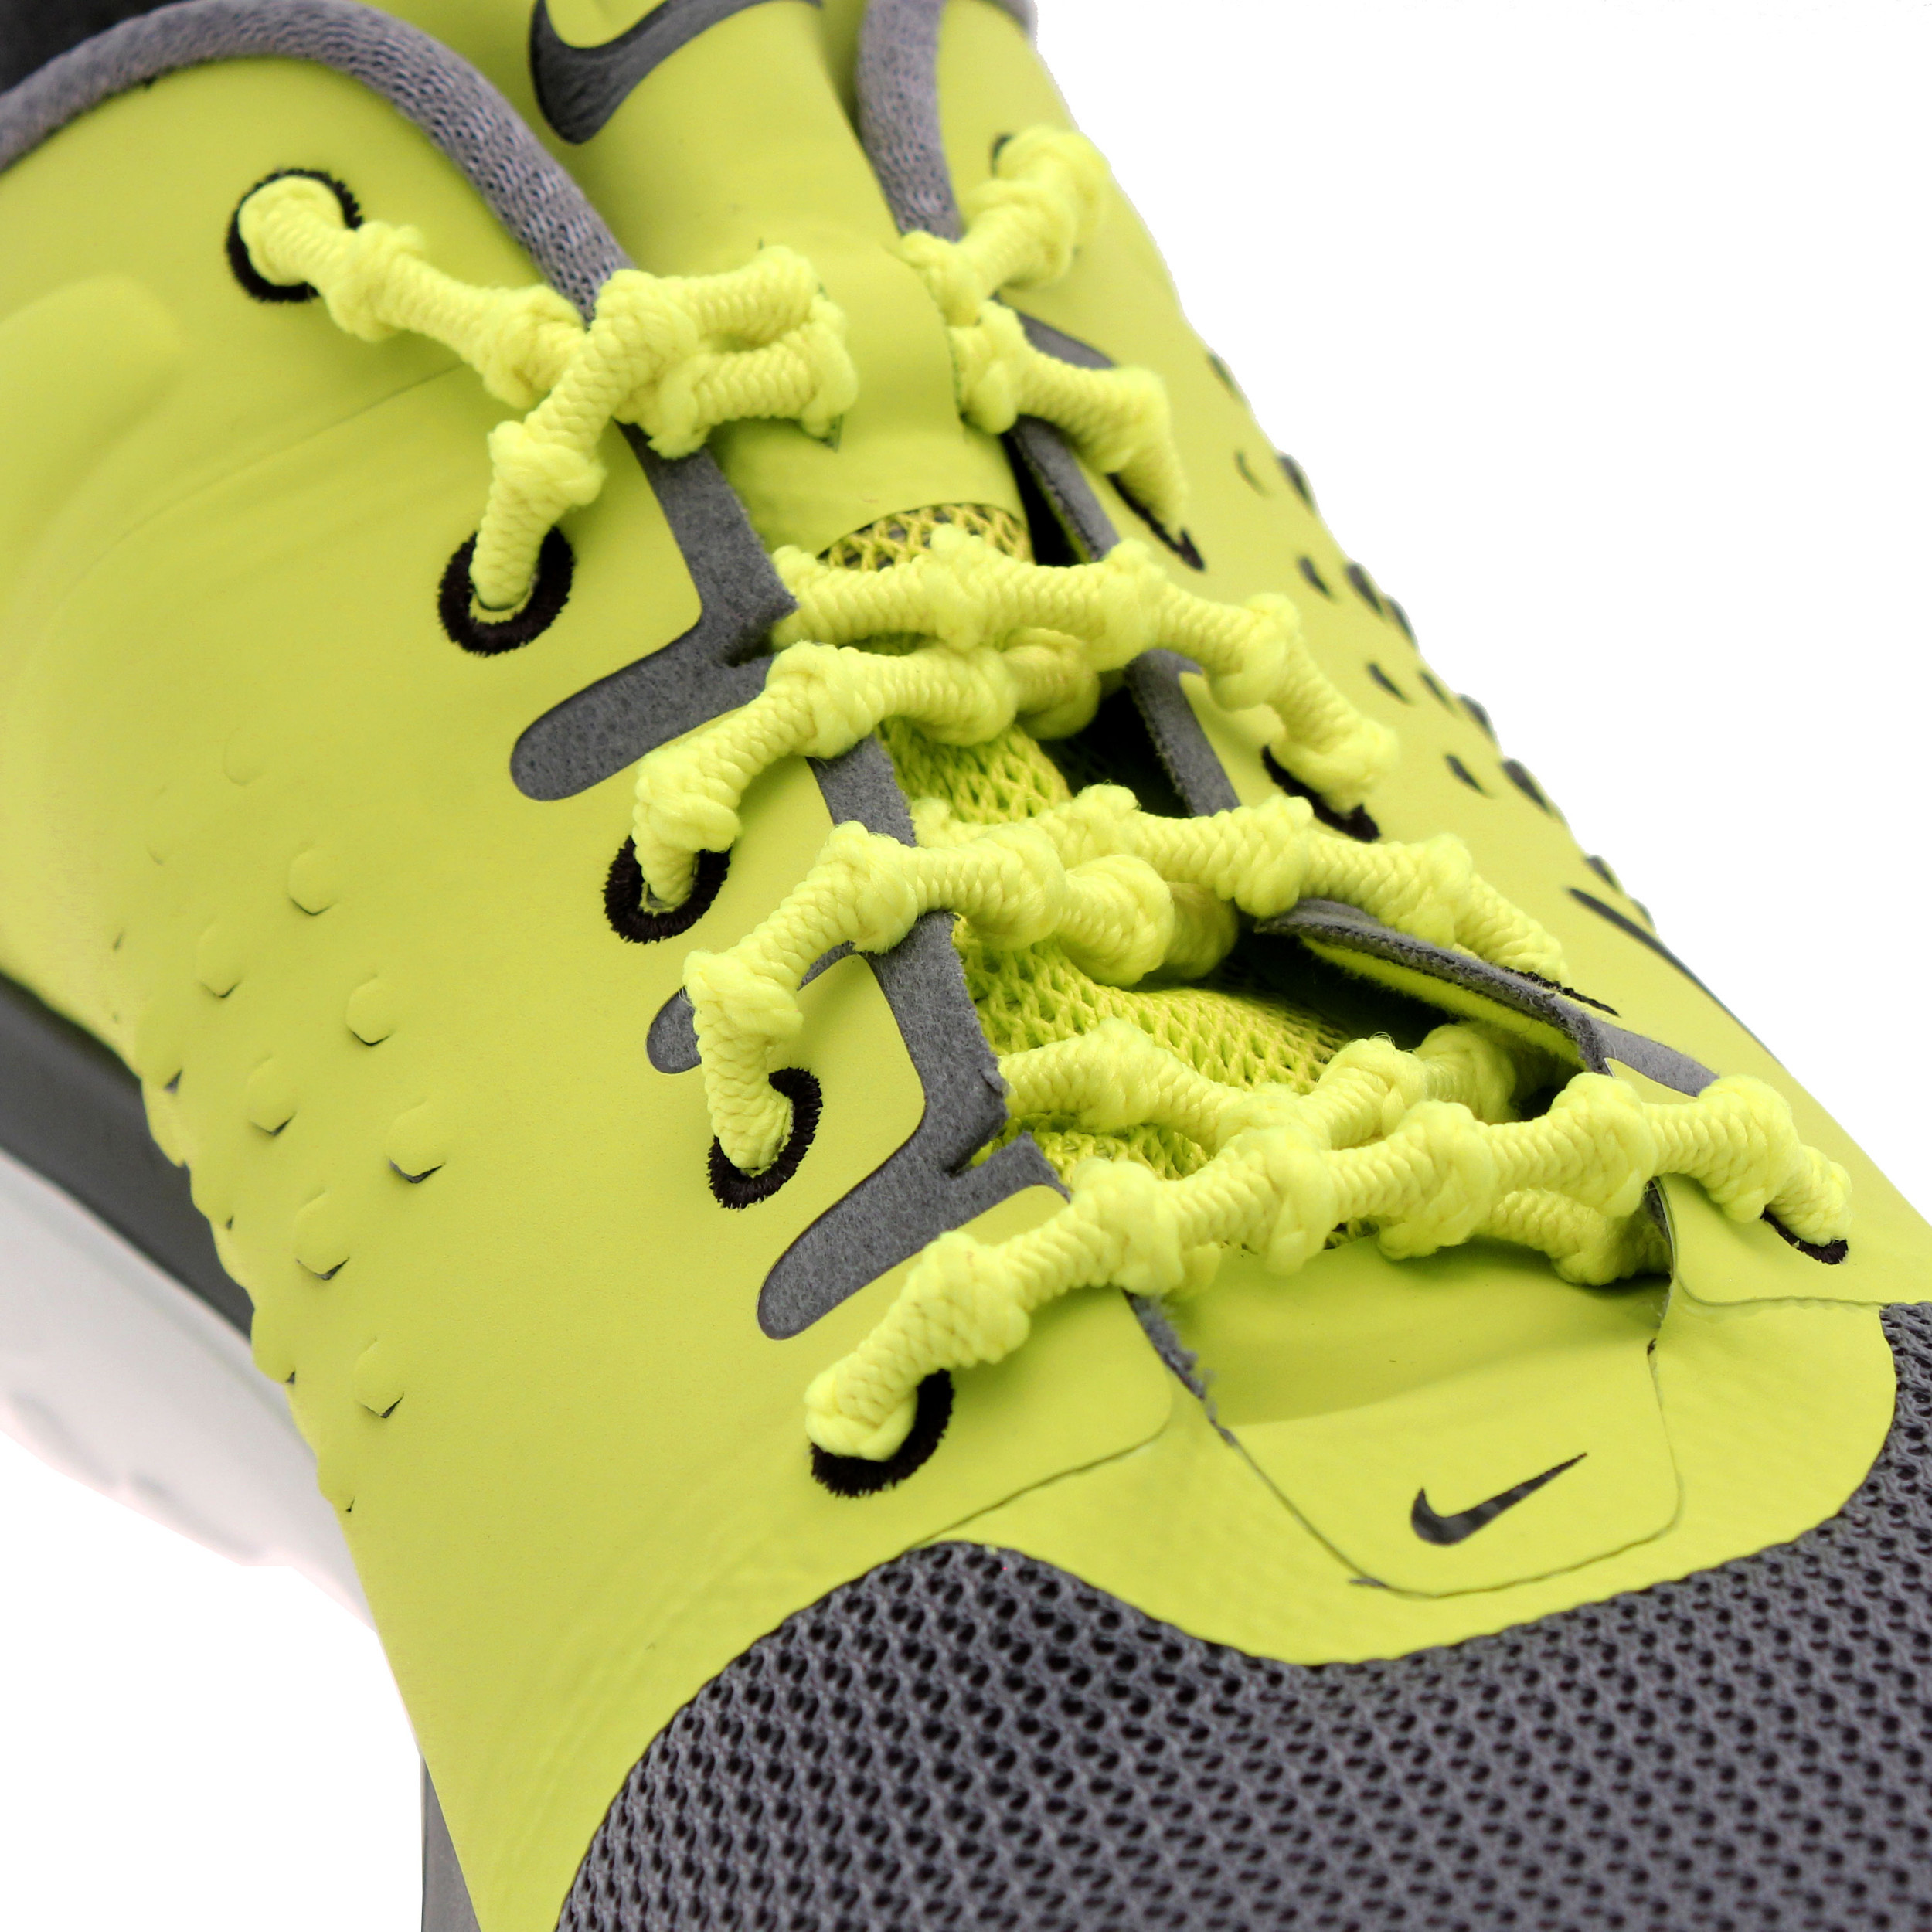 Xtenex Auto Locking Laces Mens Womens Shoe Yellow Patented Triathlon Elastic